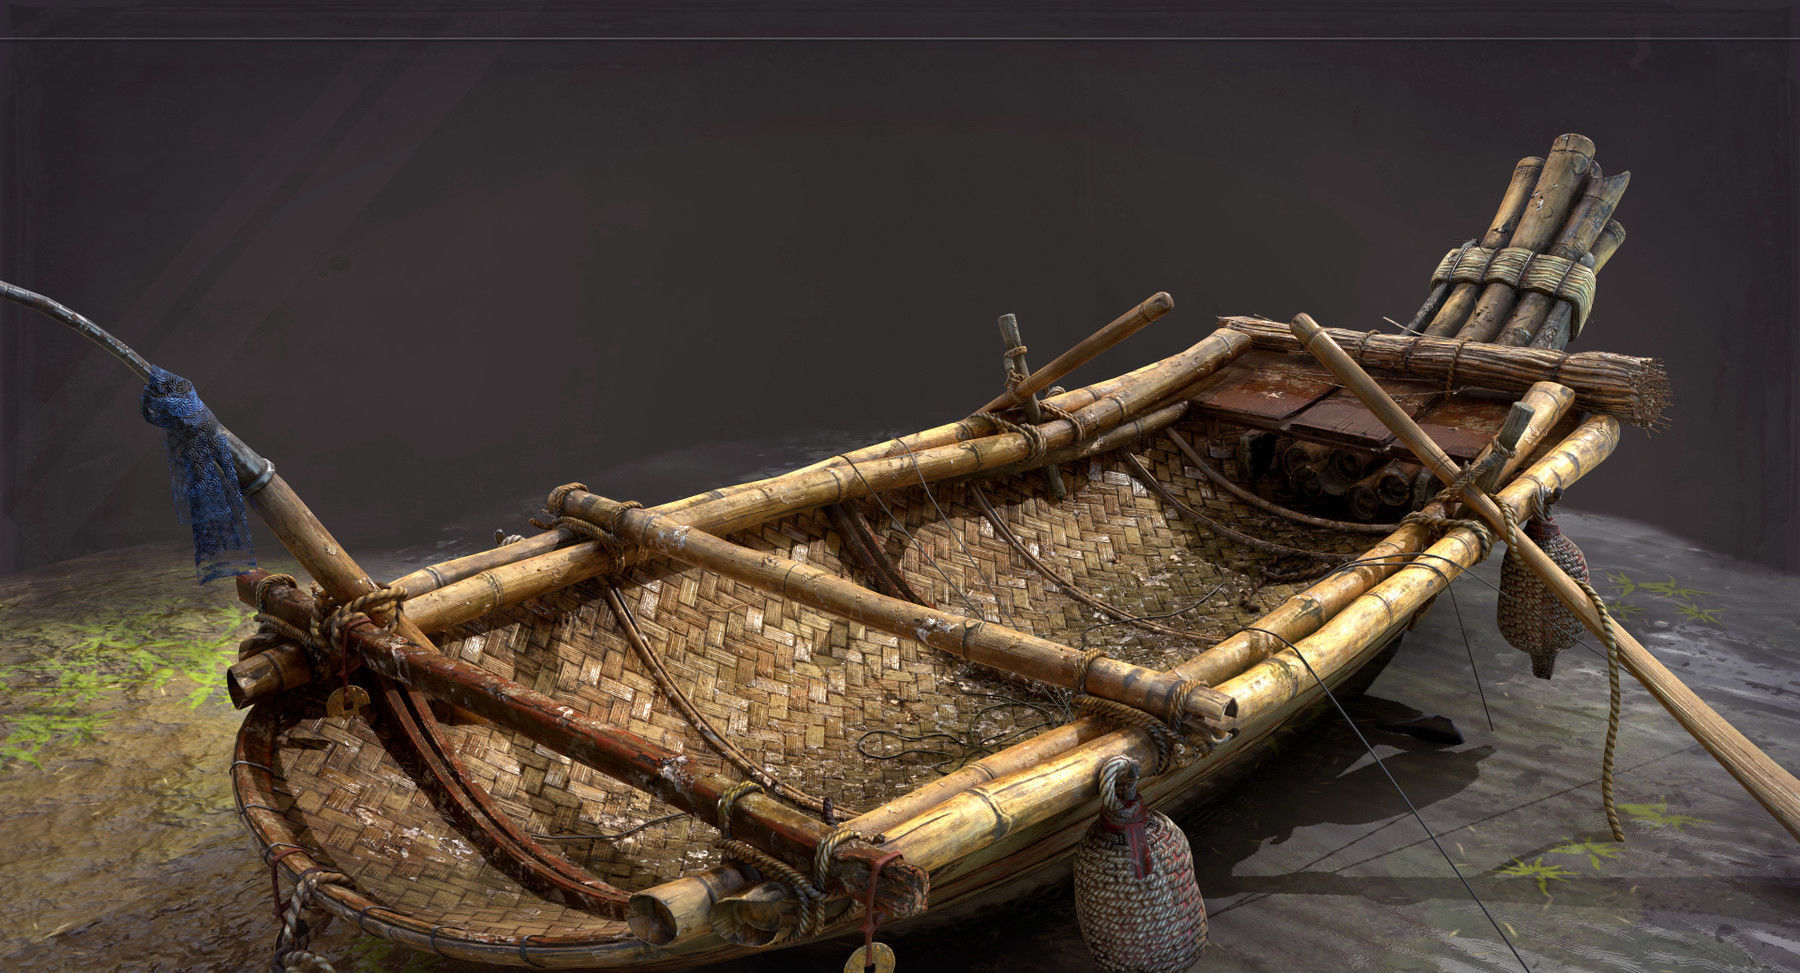 Real time era game fishing boat model